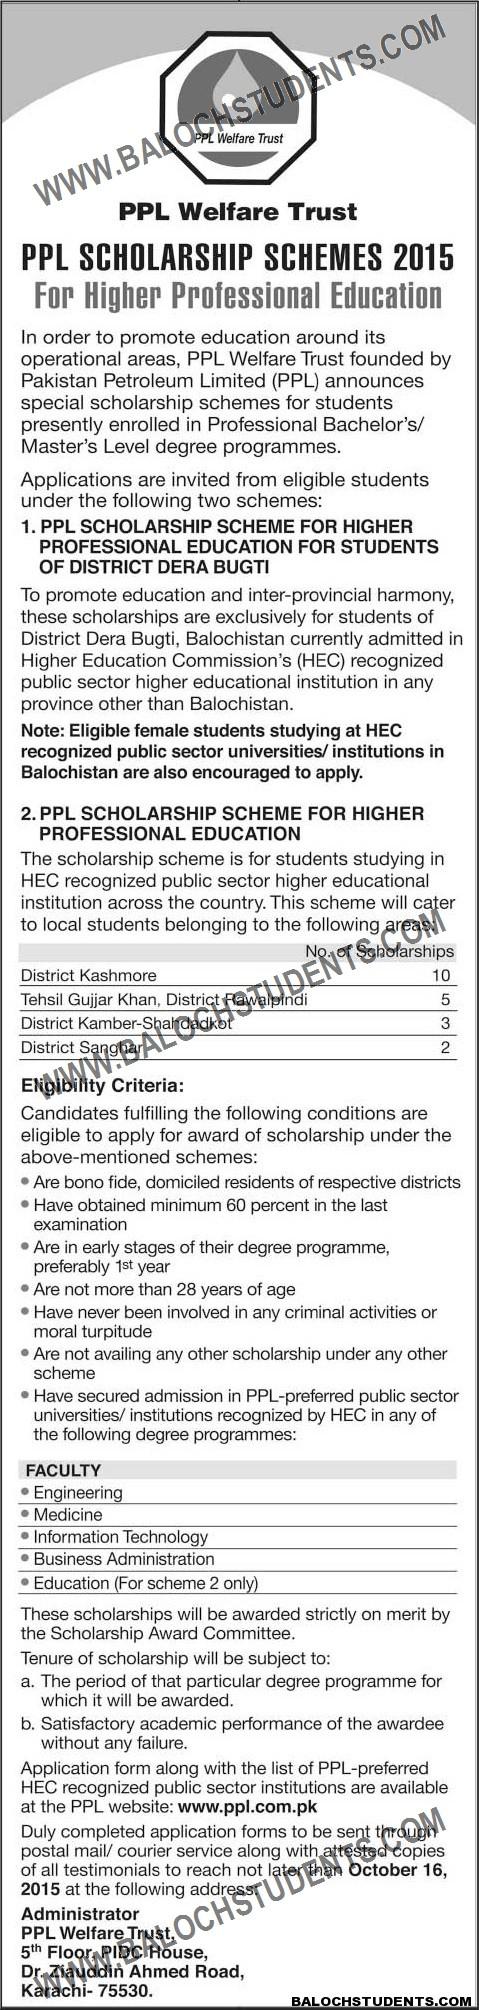 PPL Scholarship Schemes 2015